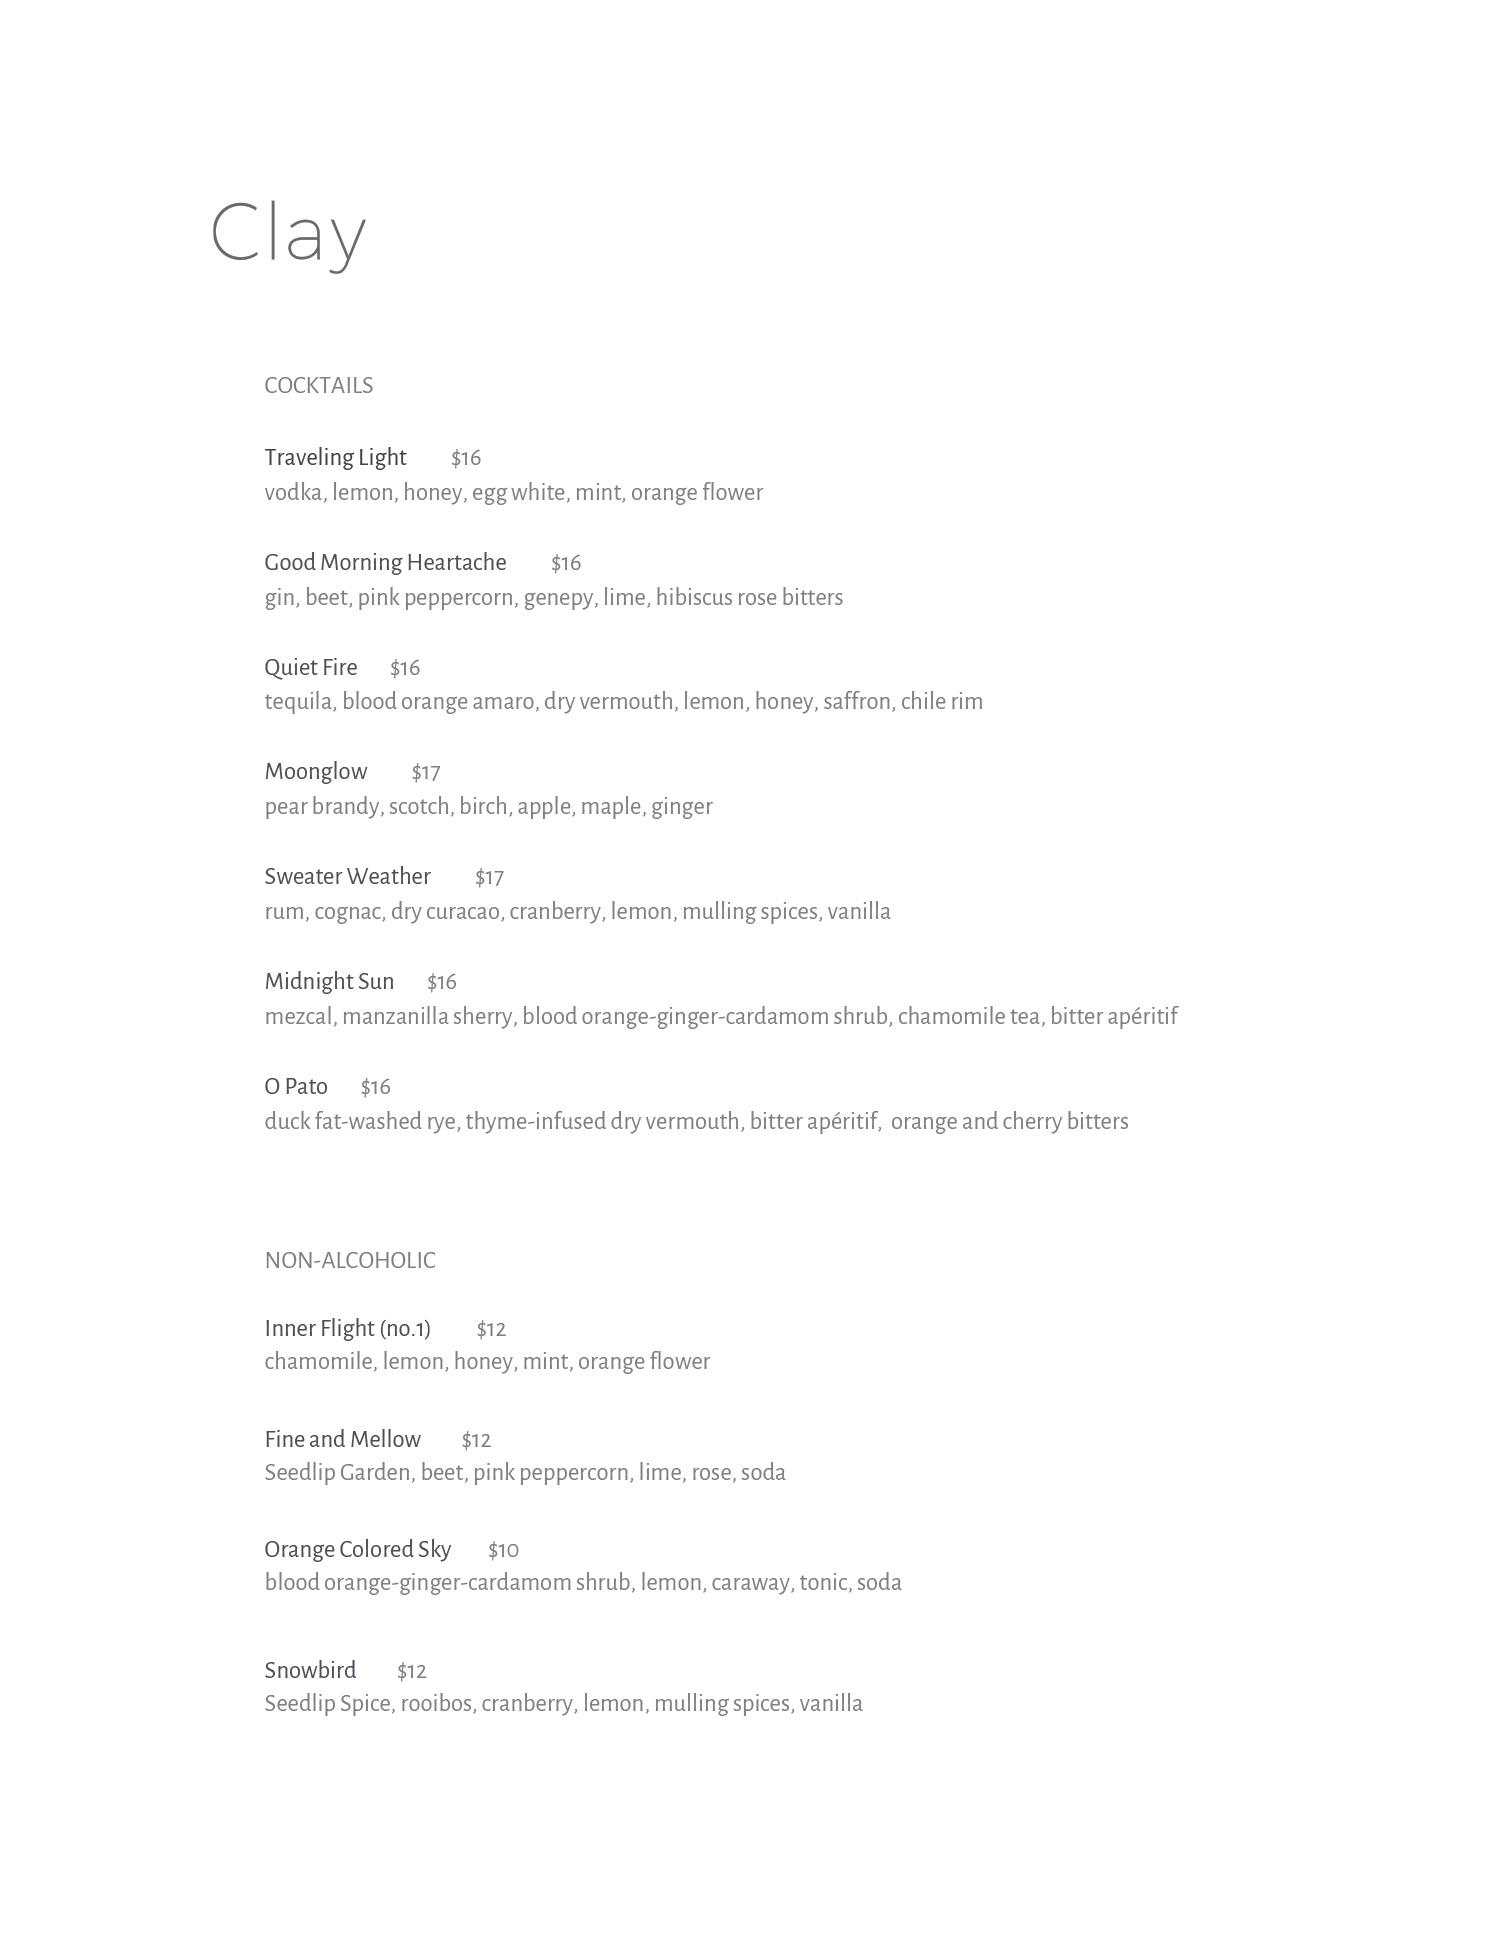 Clay-Cocktail-Summer-2-2018-1.jpg